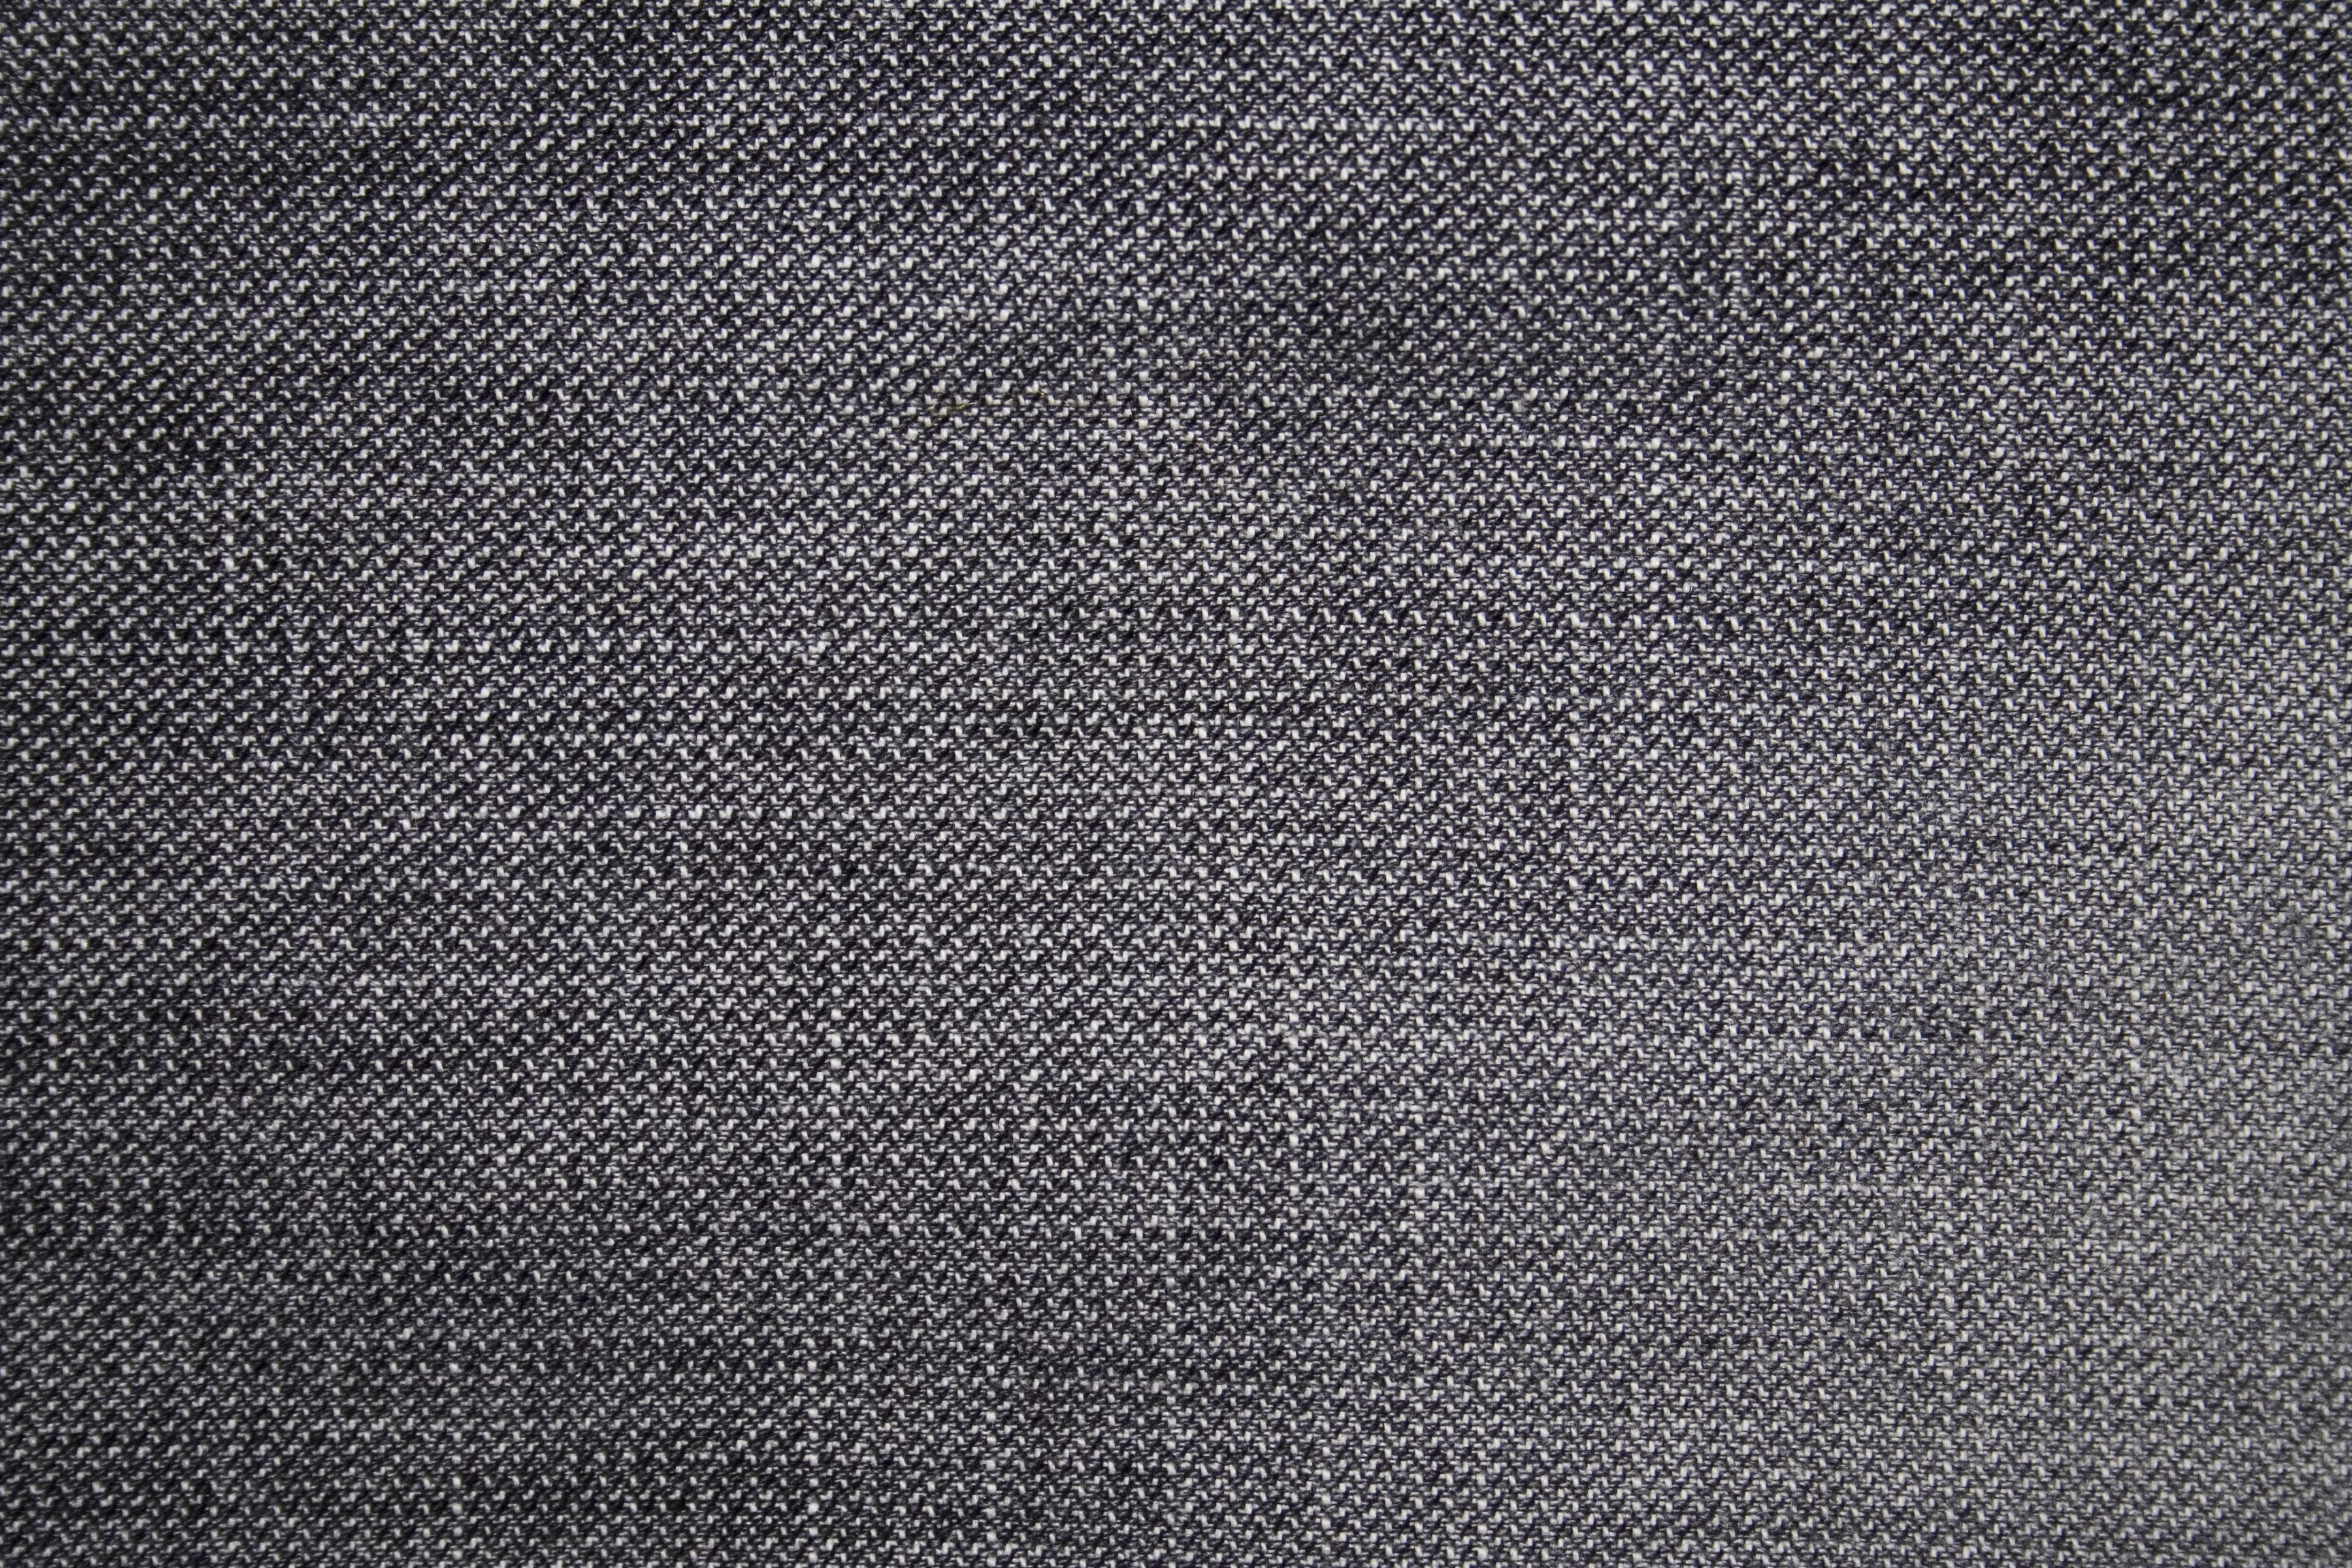 Farmer Textile Texture Closeup Textures For Photoshop Free